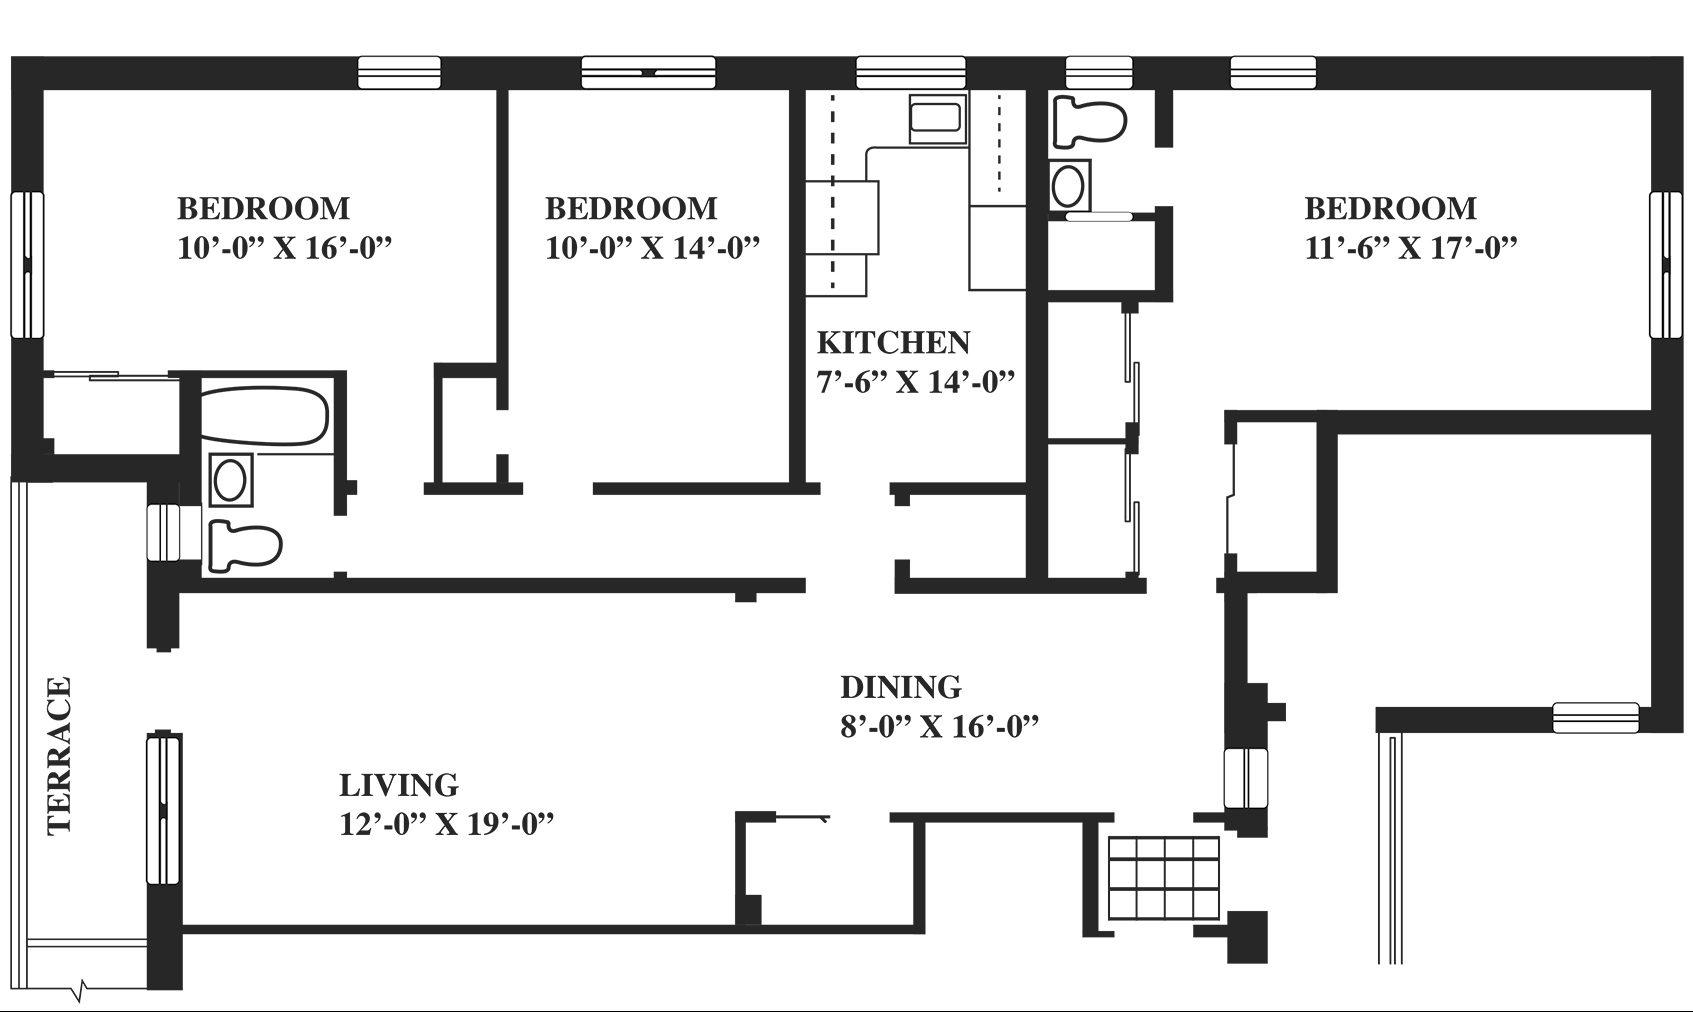 Floor Plans - 3 Bedrooms - Greenwich Close Apartments intended for 3 Bedroom Flat Floor Plan